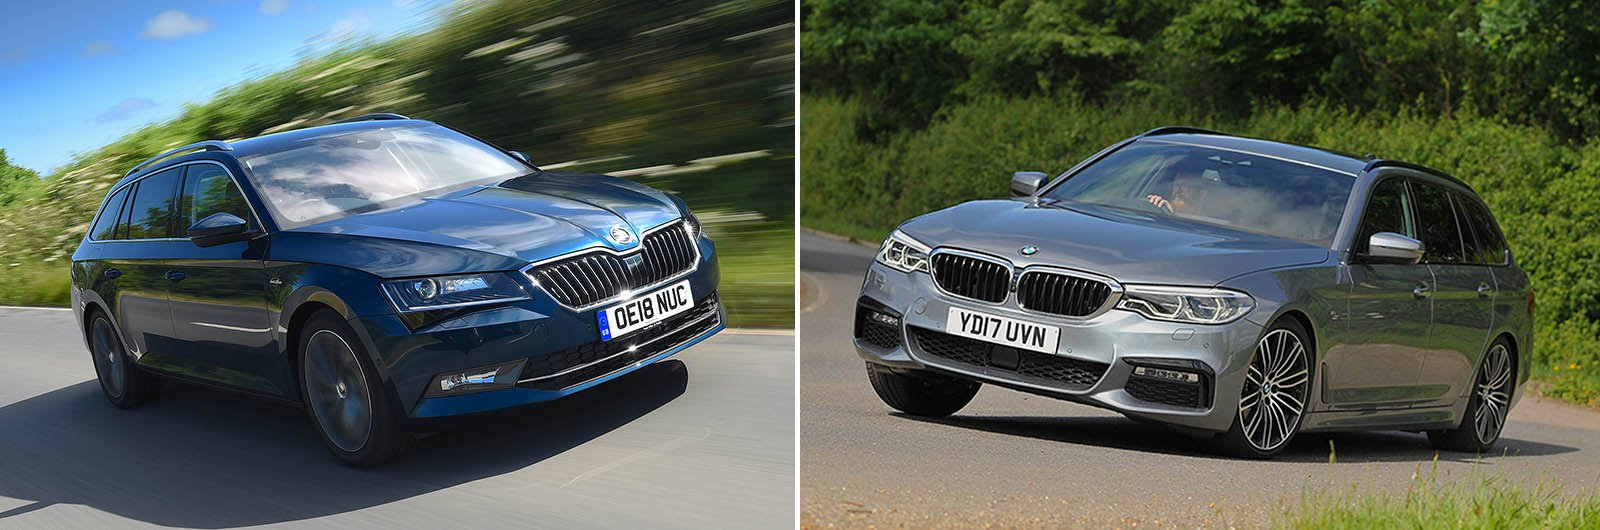 New Skoda Superb Estate vs used BMW 5 Series Touring